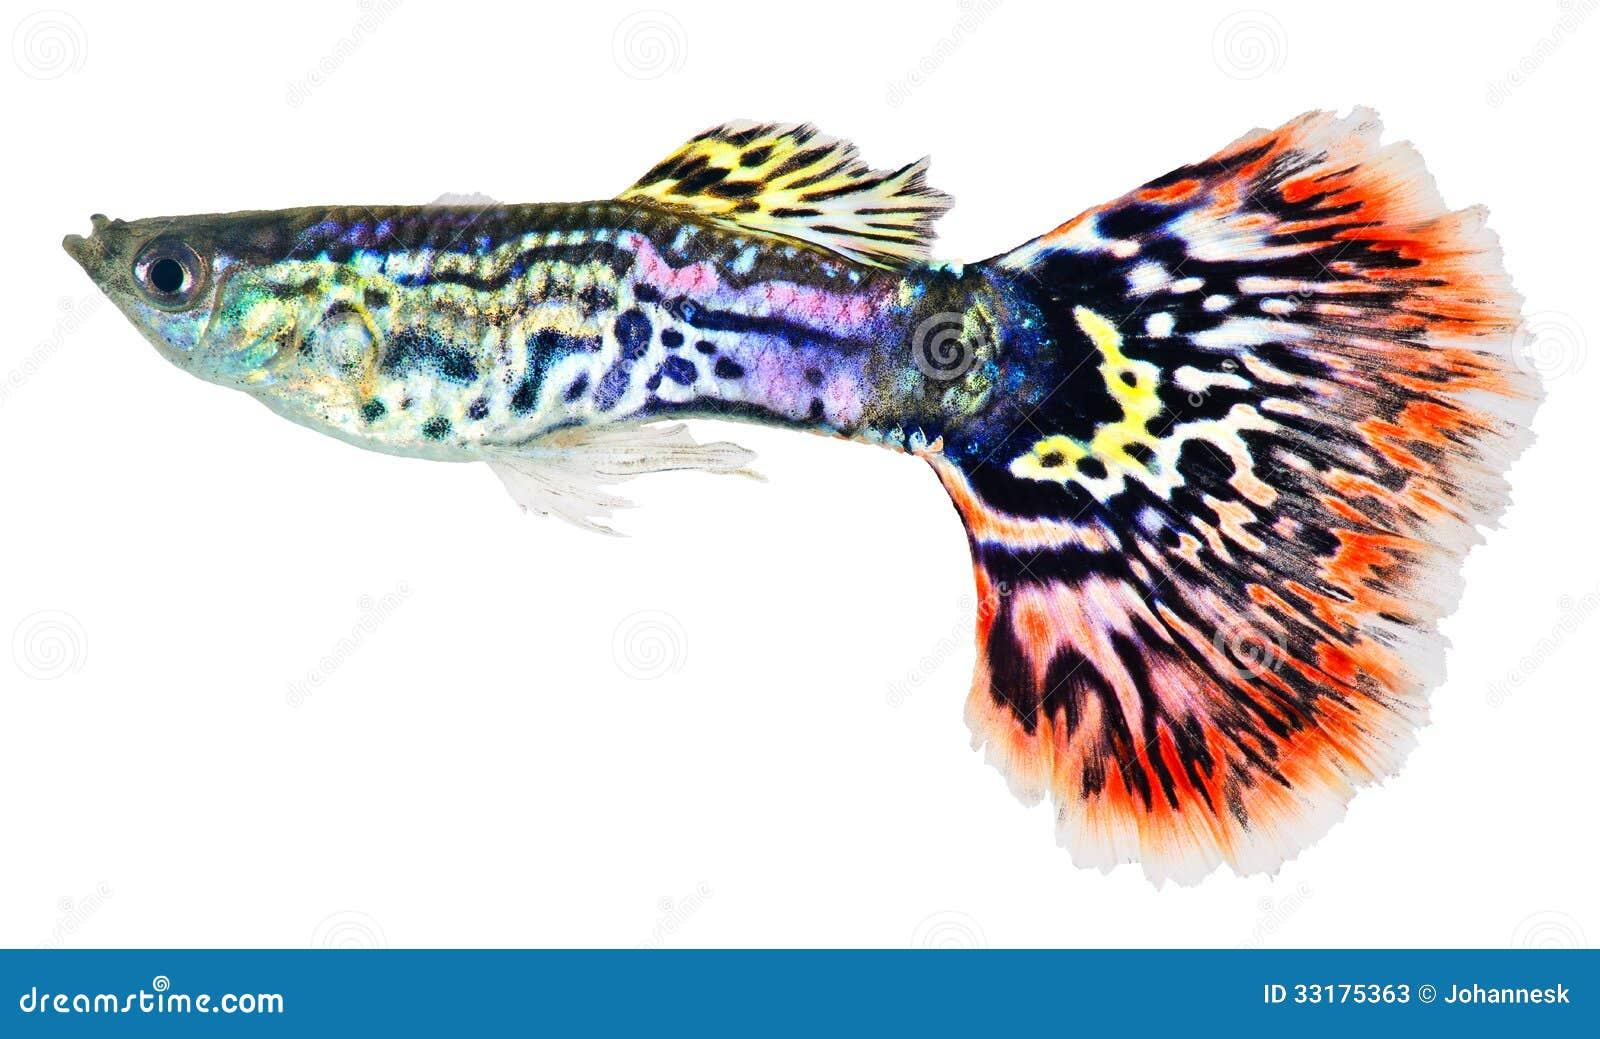 Guppy Poecilia Reticulata Guppy Freshwater Fish Care | Dog ...